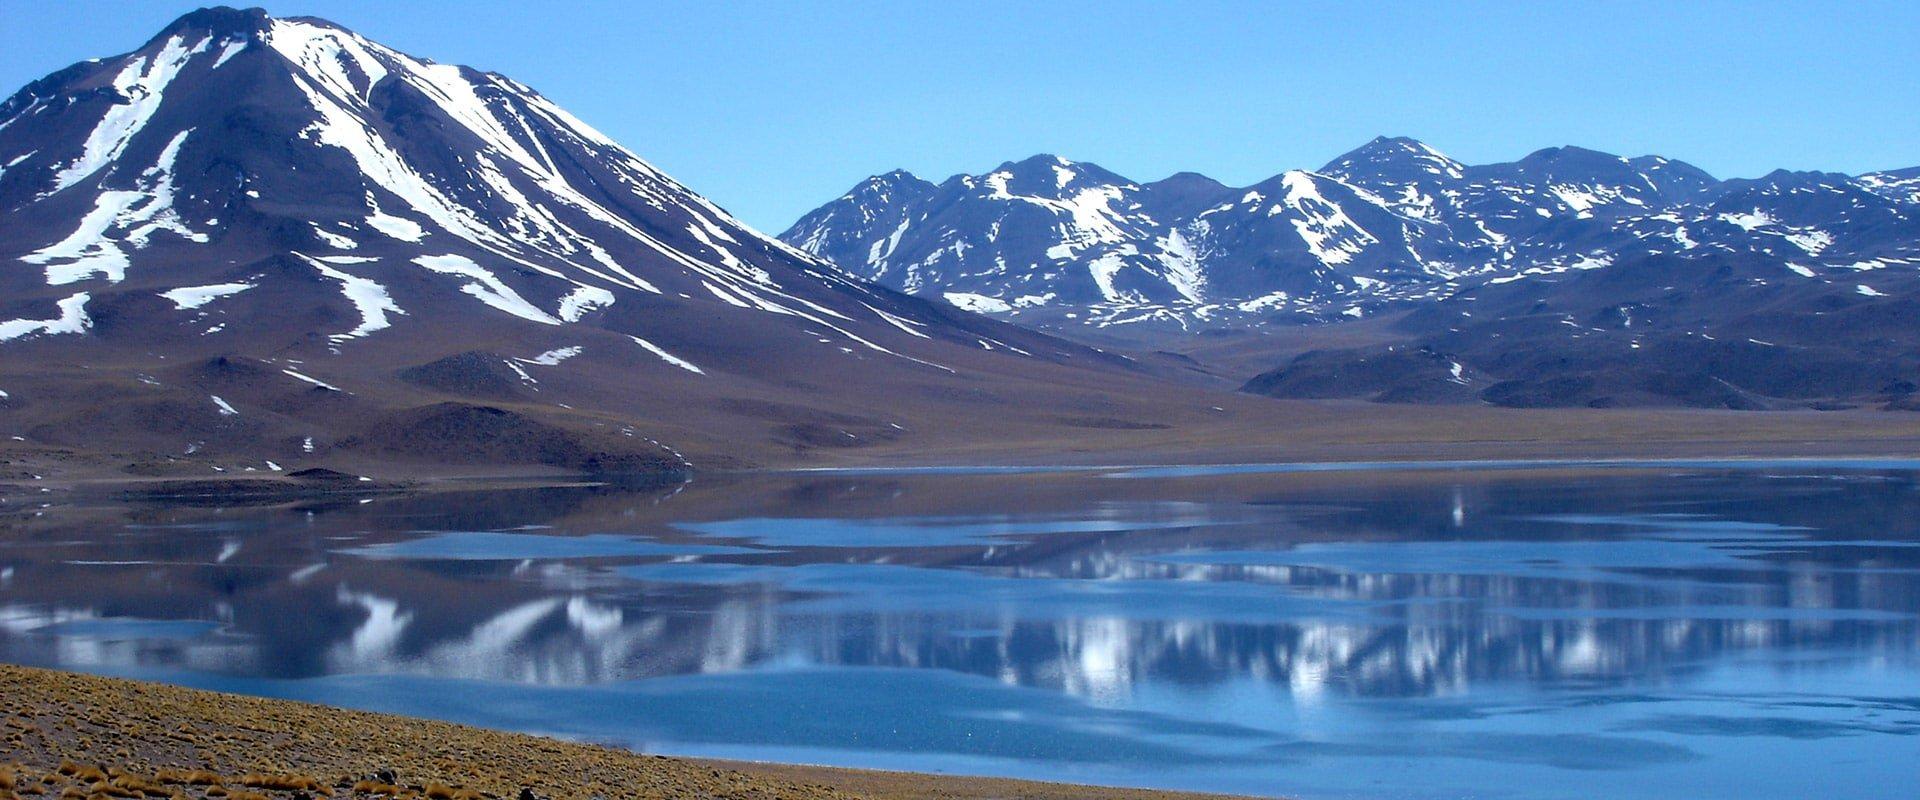 Chili Laguna Miscanti Atacama tierra latina